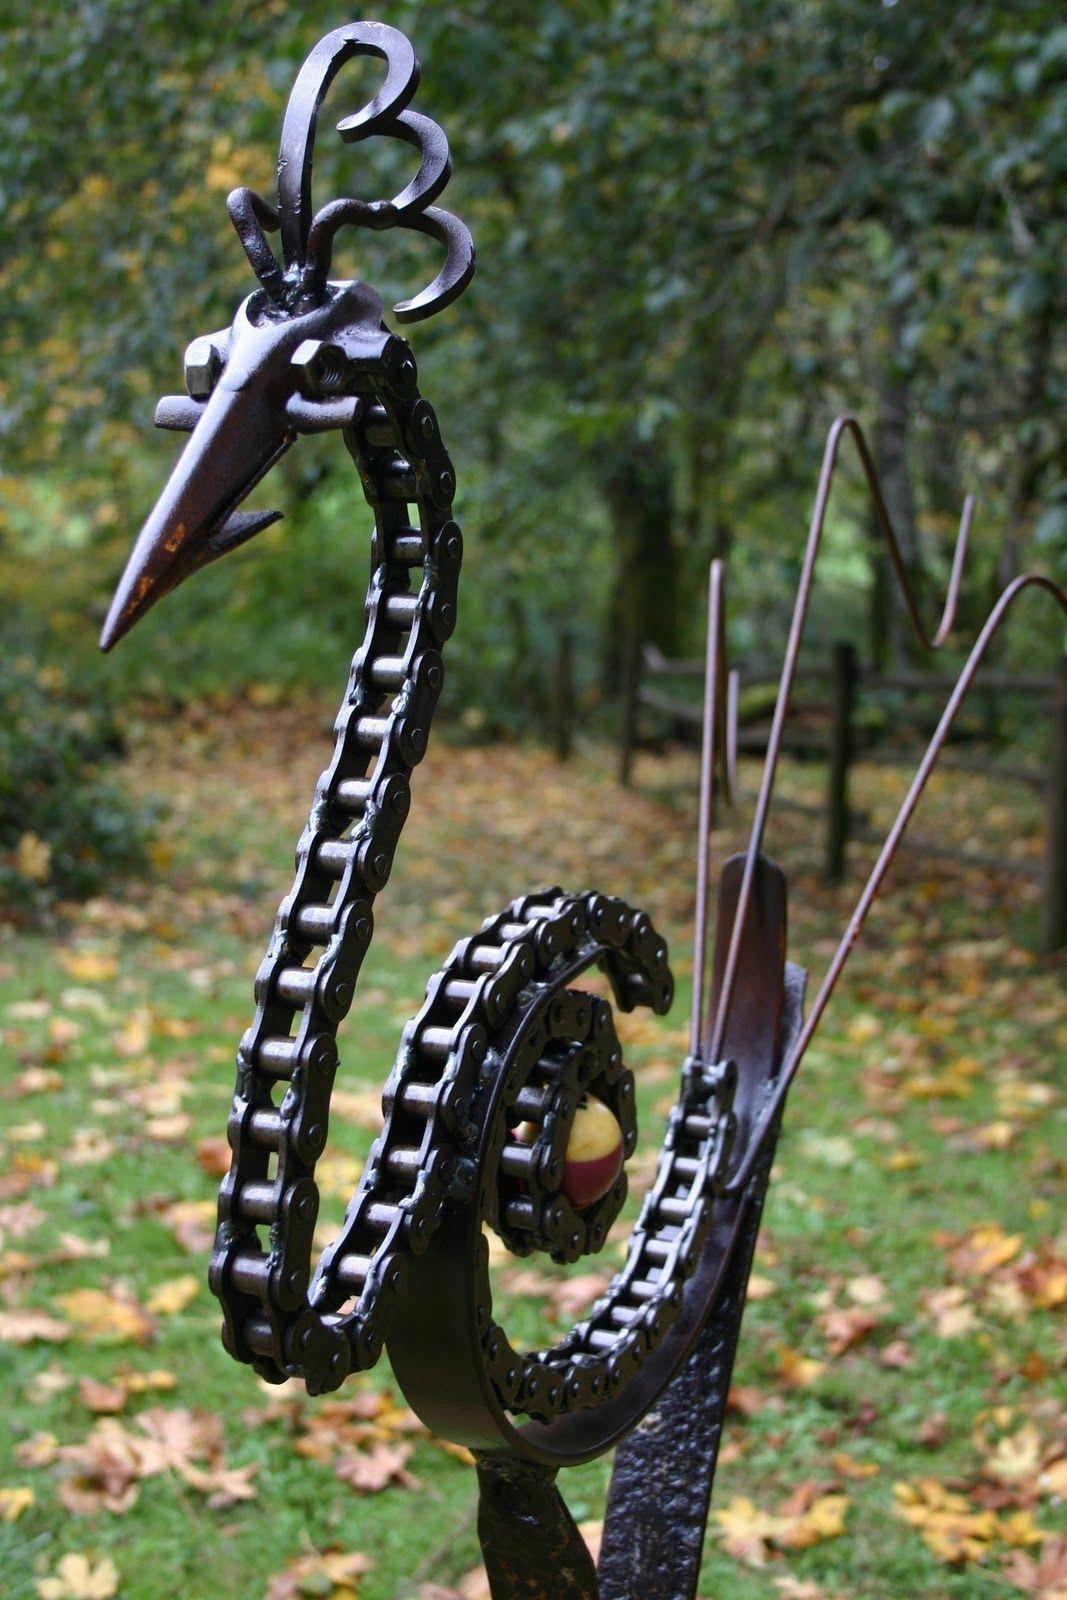 Welding Chain Art Weldingart Sculpture Animaux Soudure Artistique Art Des Jardins